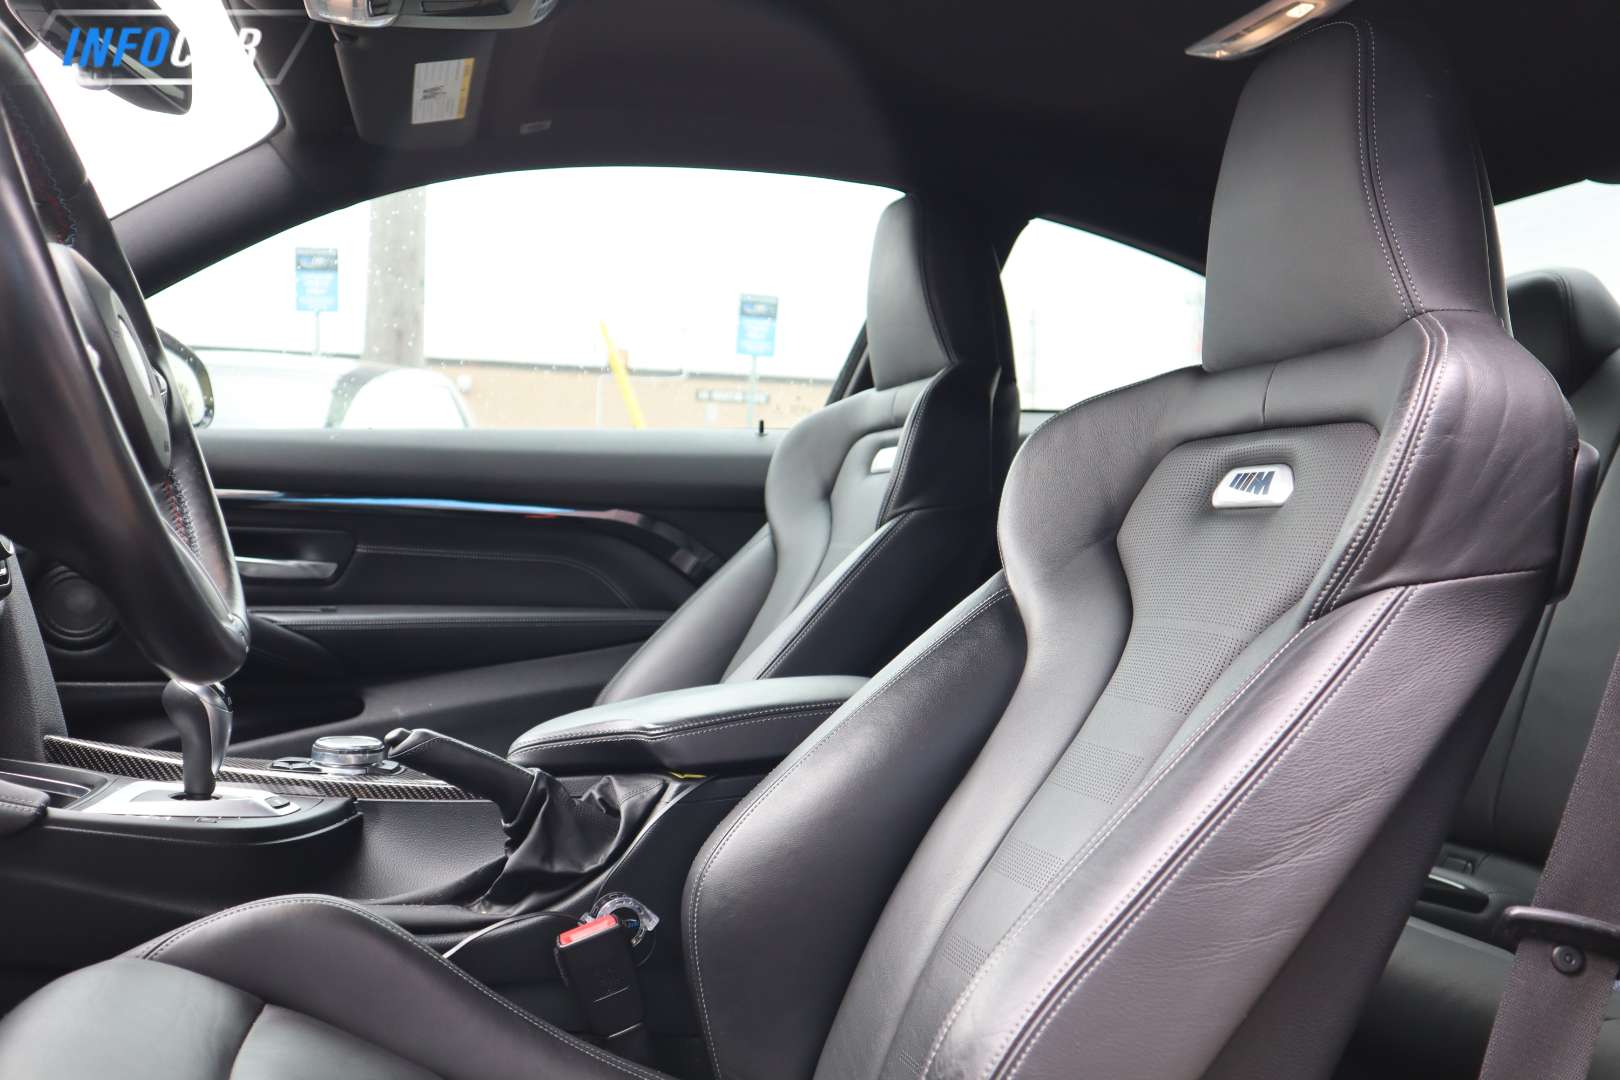 2016 BMW M4  - INFOCAR - Toronto's Most Comprehensive New and Used Auto Trading Platform